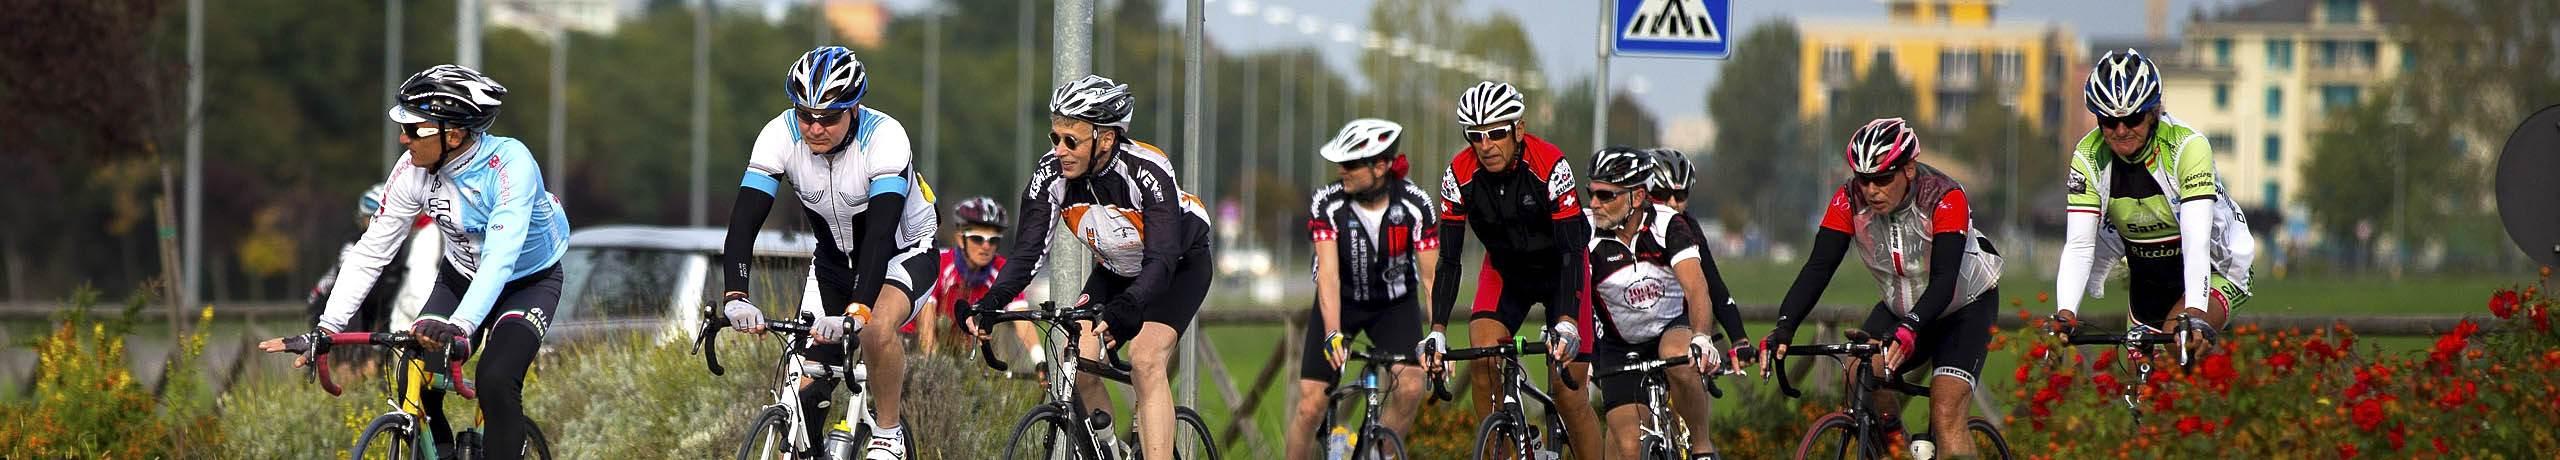 Gruppo.bike_